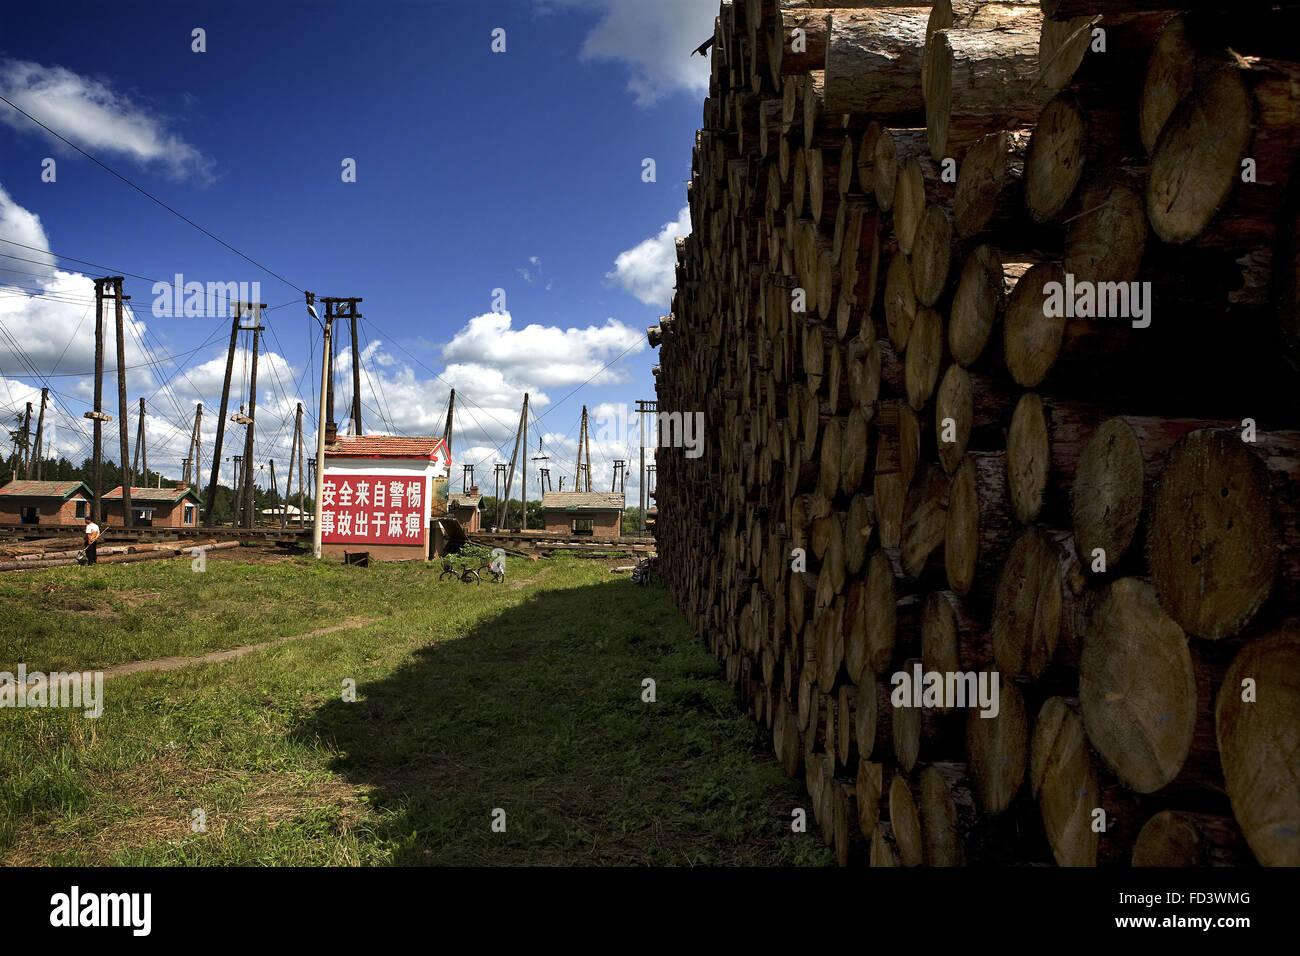 Tree Farm Baishan City Northeast Jilin Province China - Stock Image